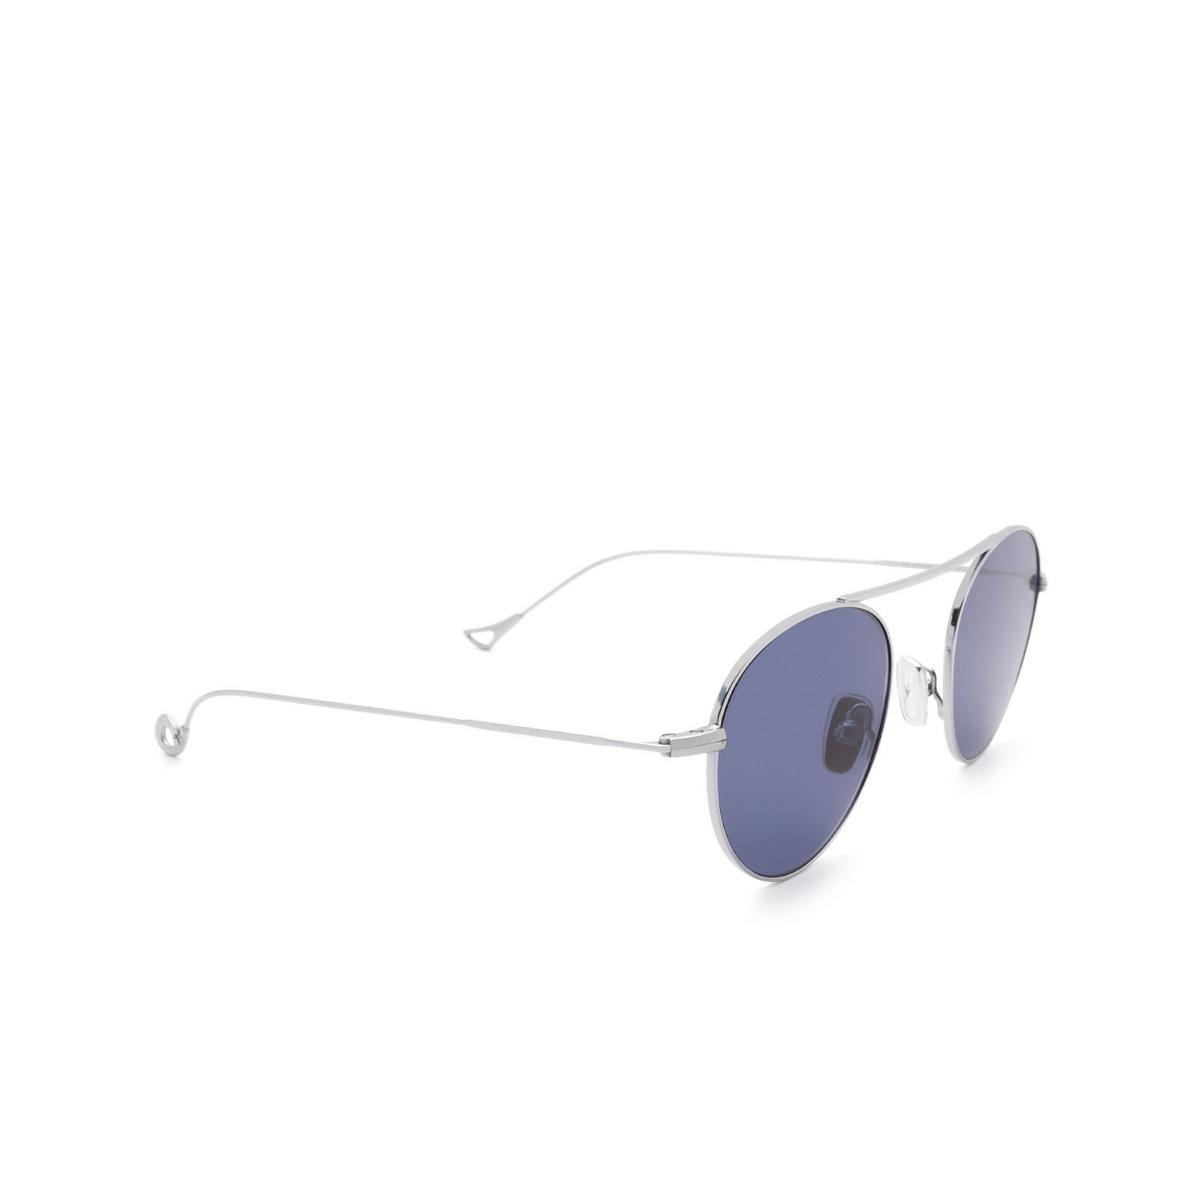 Eyepetizer® Round Sunglasses: En Bossa color Silver C.1-39 - three-quarters view.